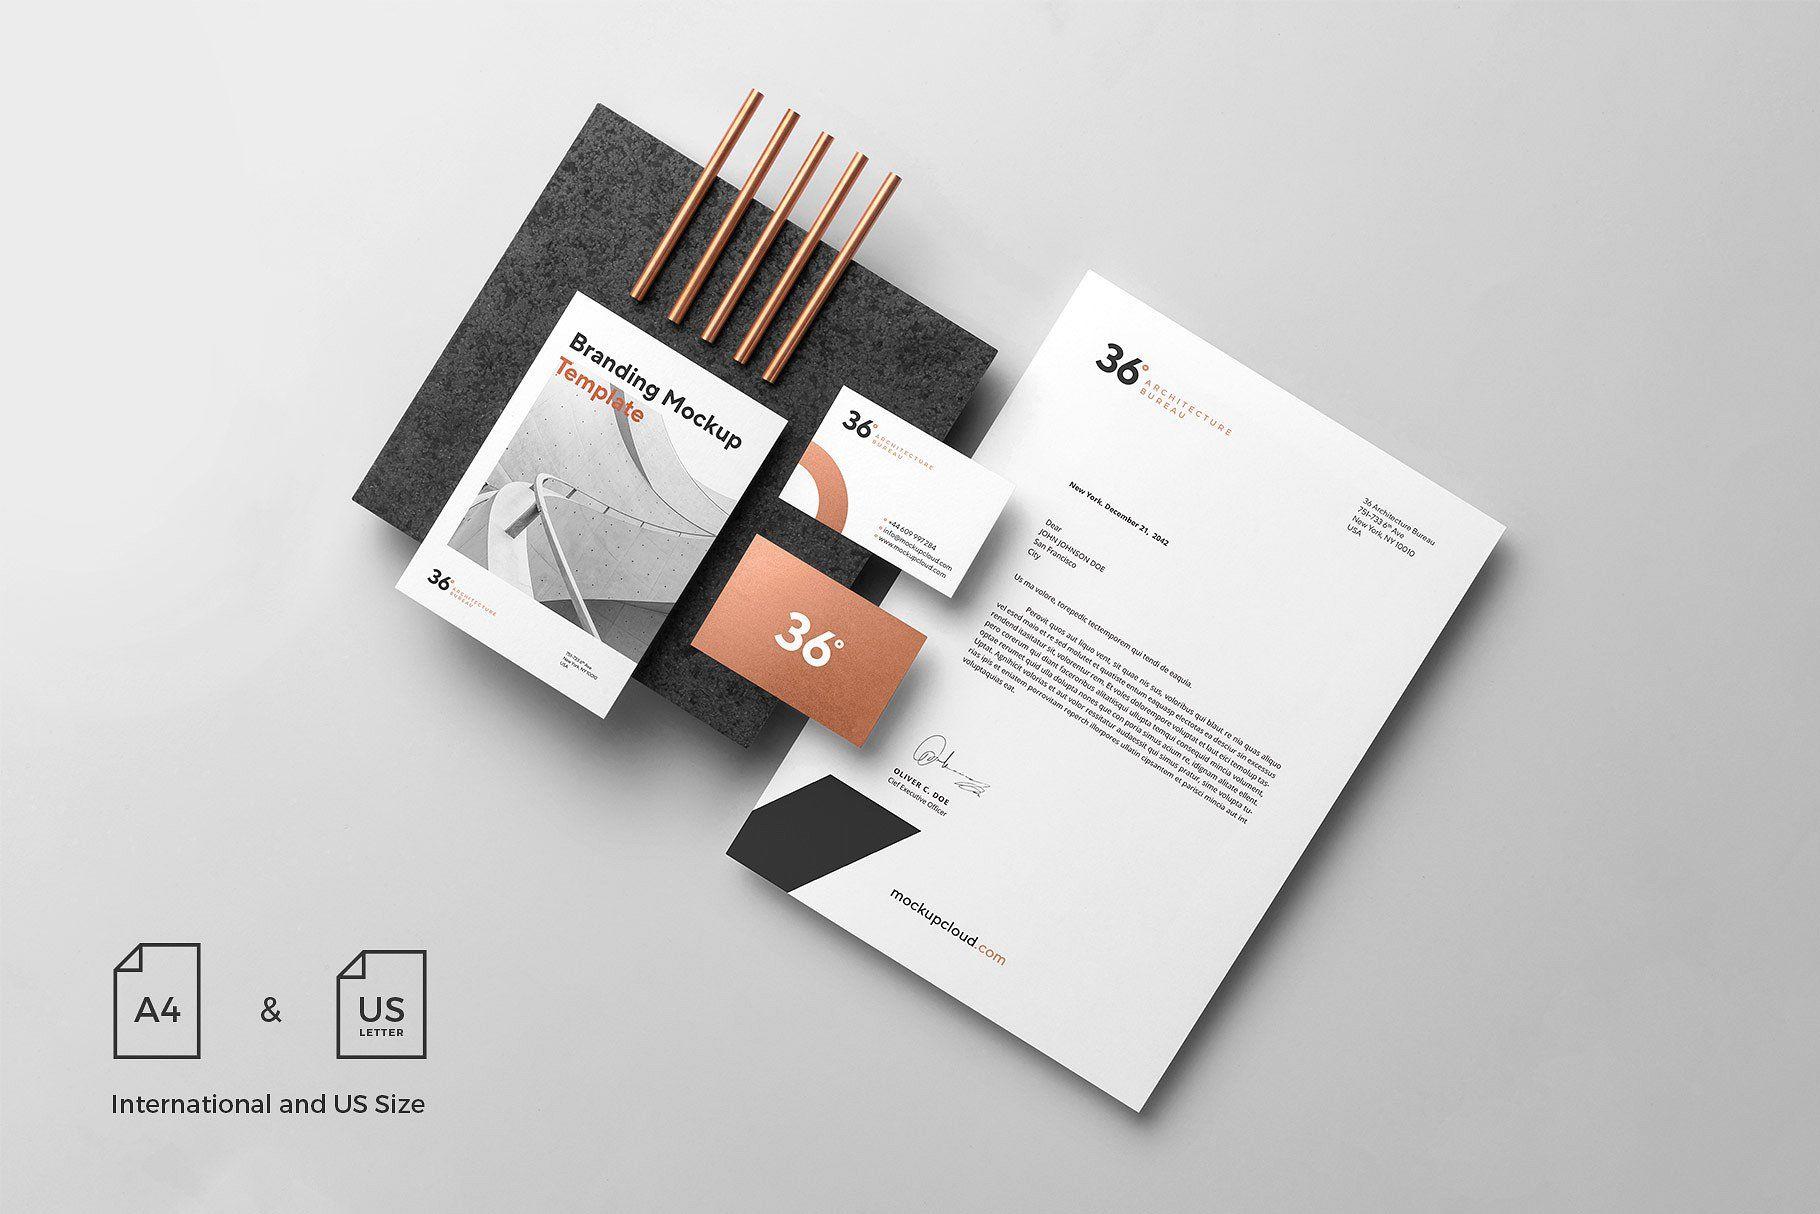 Copperstone Branding Mockup Vol 1 Branding Mockups Branding Branding Template